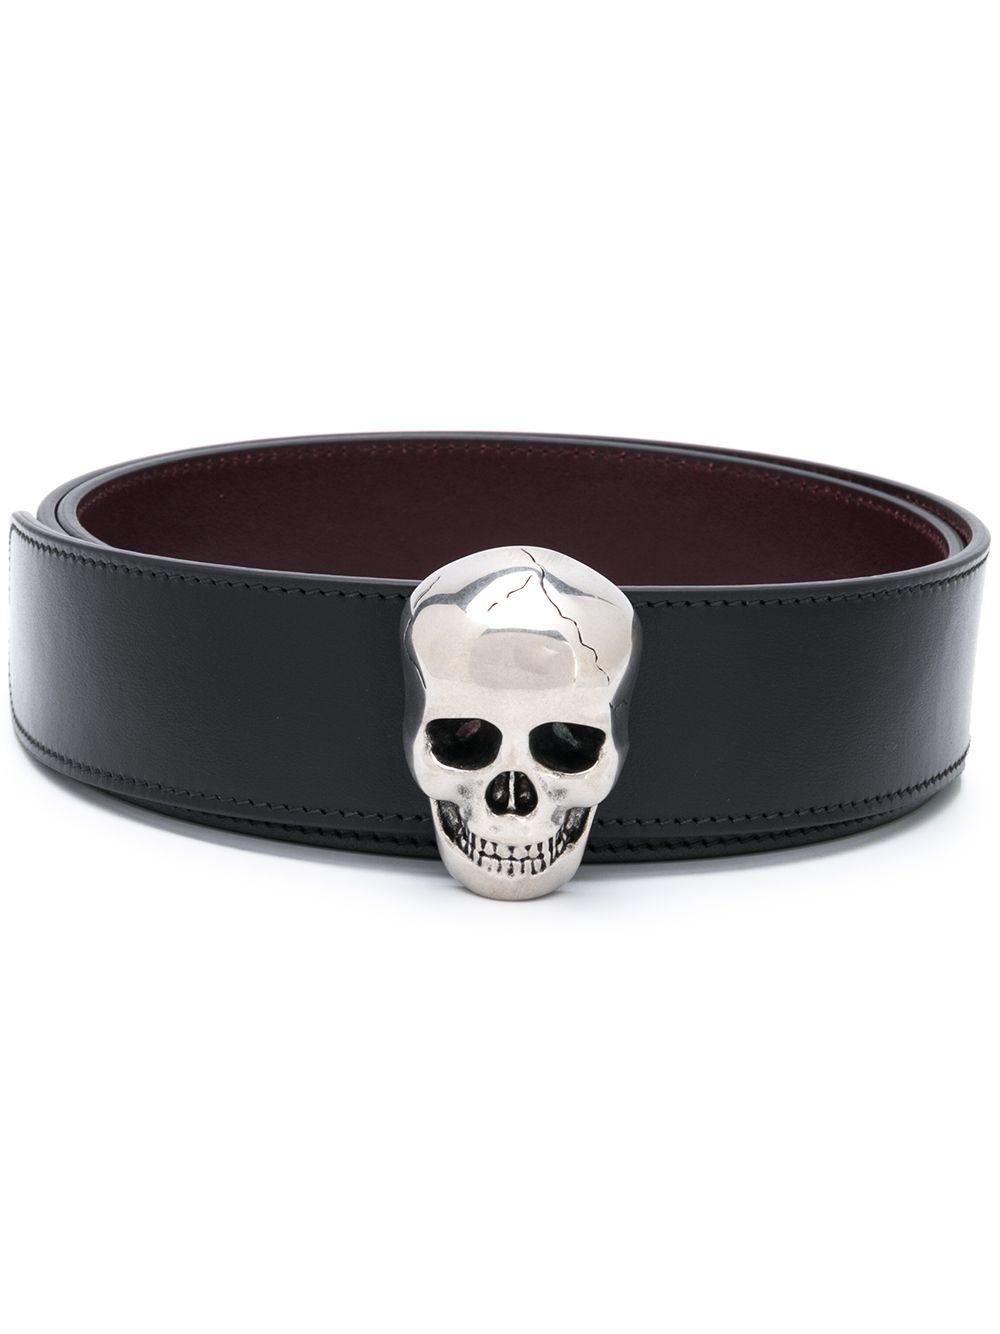 Skull Leather Buckle Belt